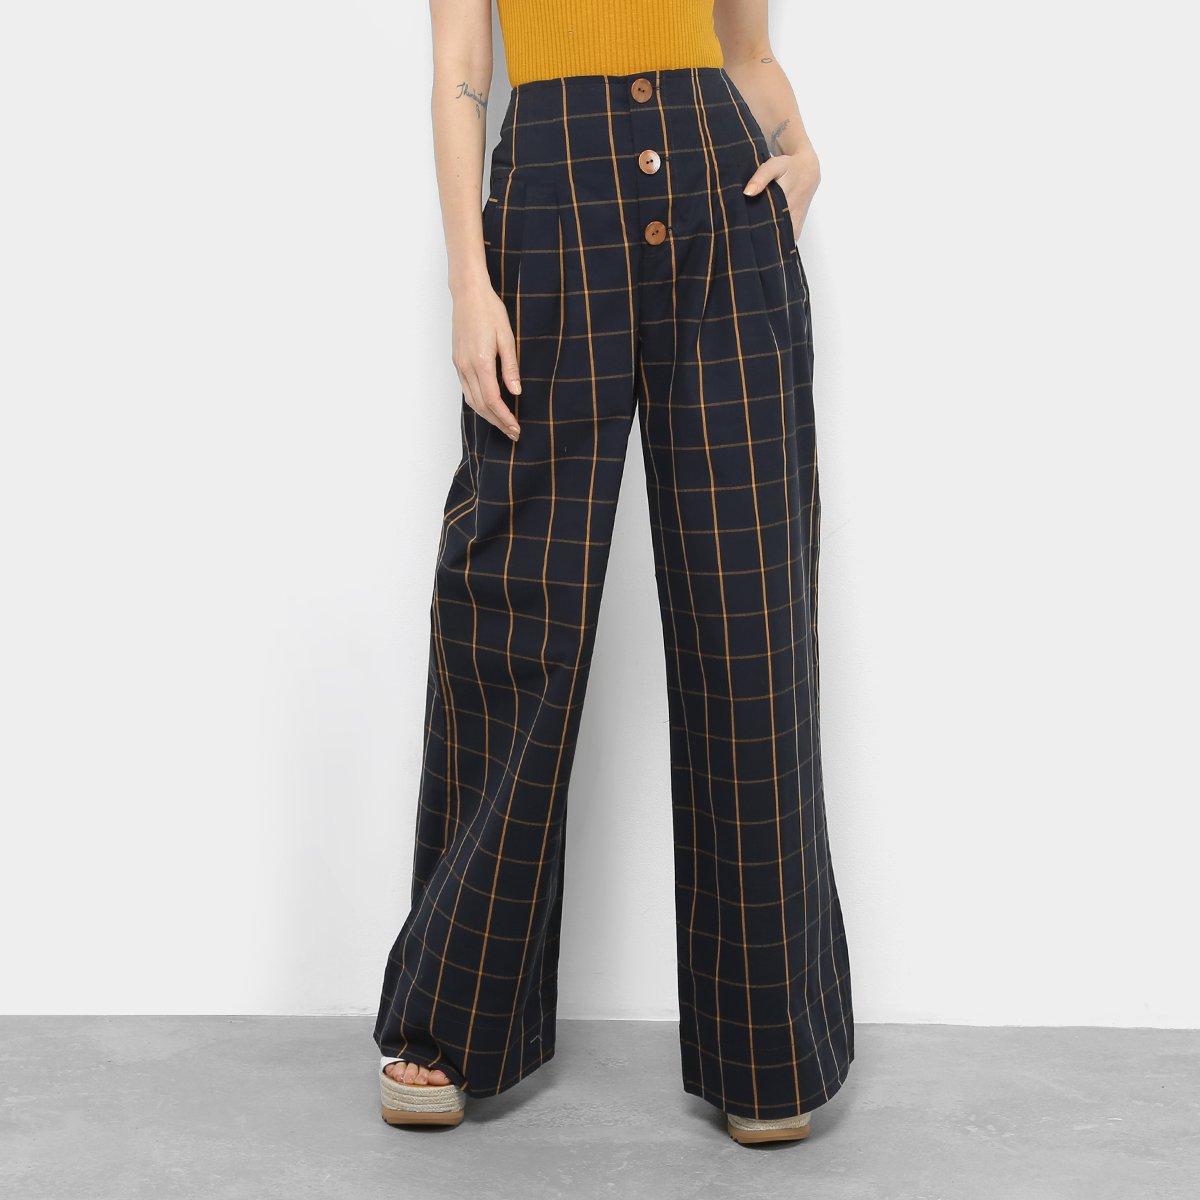 0c2735961 Calça Colcci Xadrez Pantalona Cintura Alta Feminina - Compre Agora | Zattini